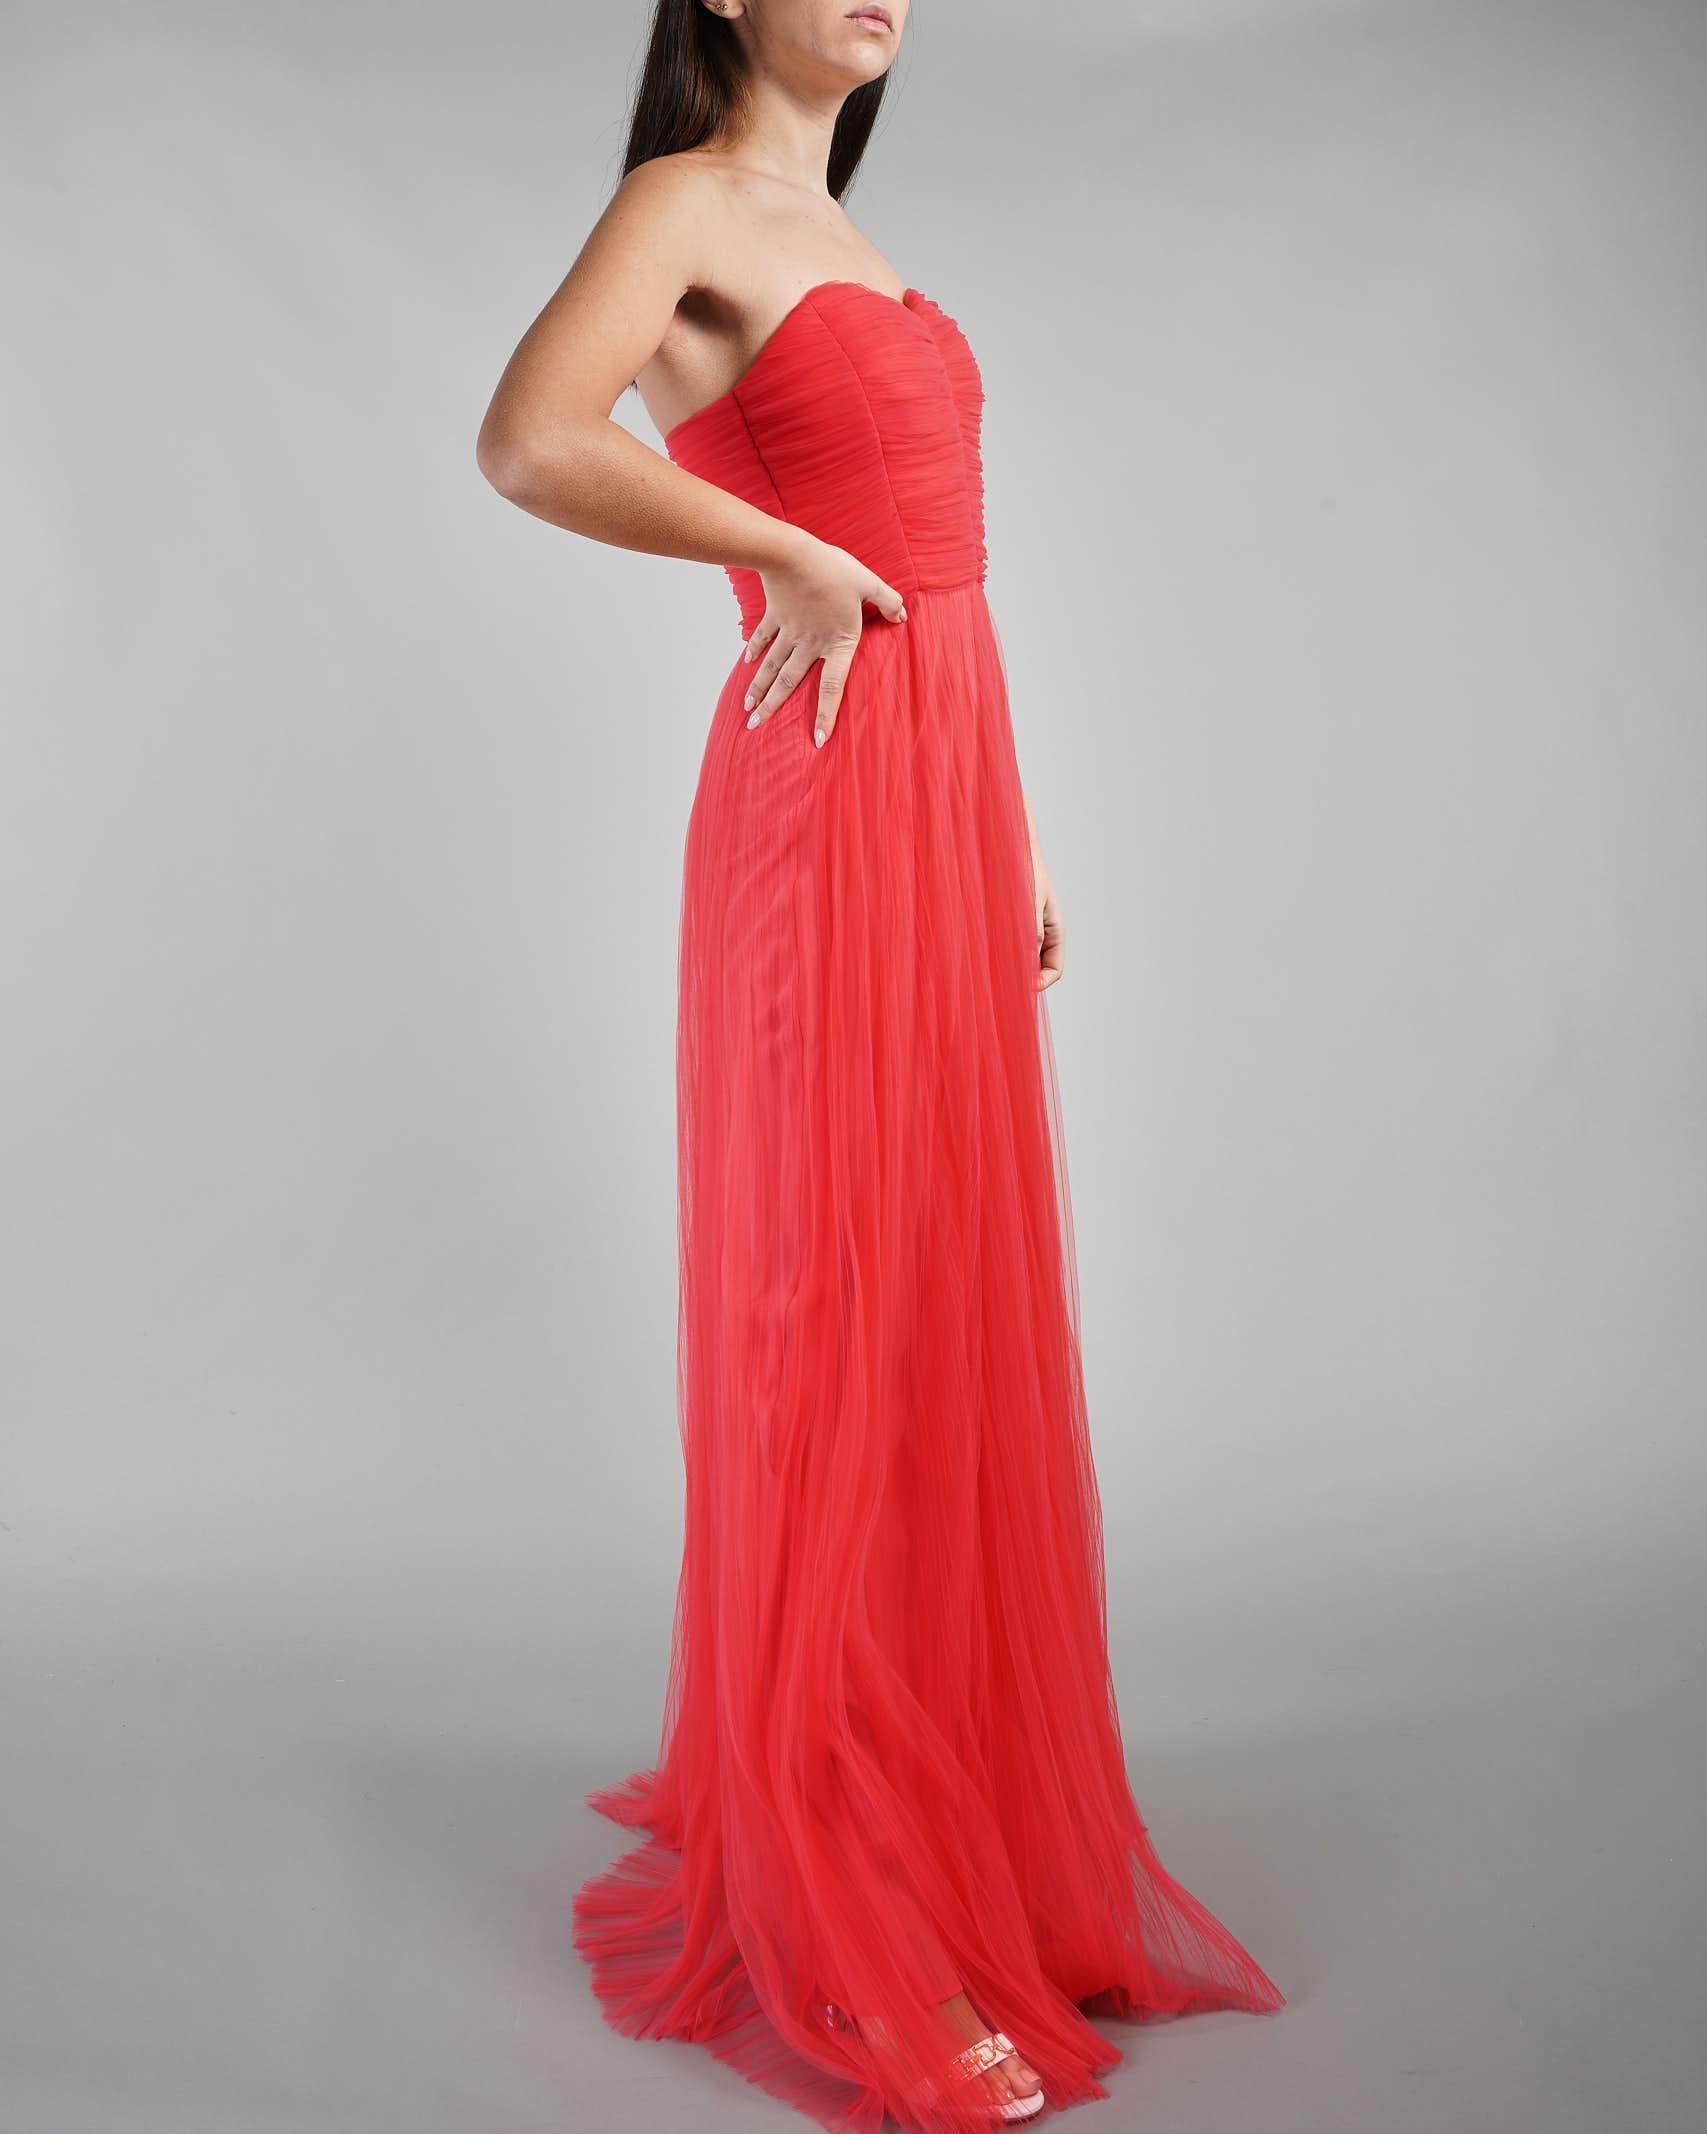 Abito Red Carpet in tulle Elisabetta Franchi ELISABETTA FRANCHI | Abito | AB09211E2620